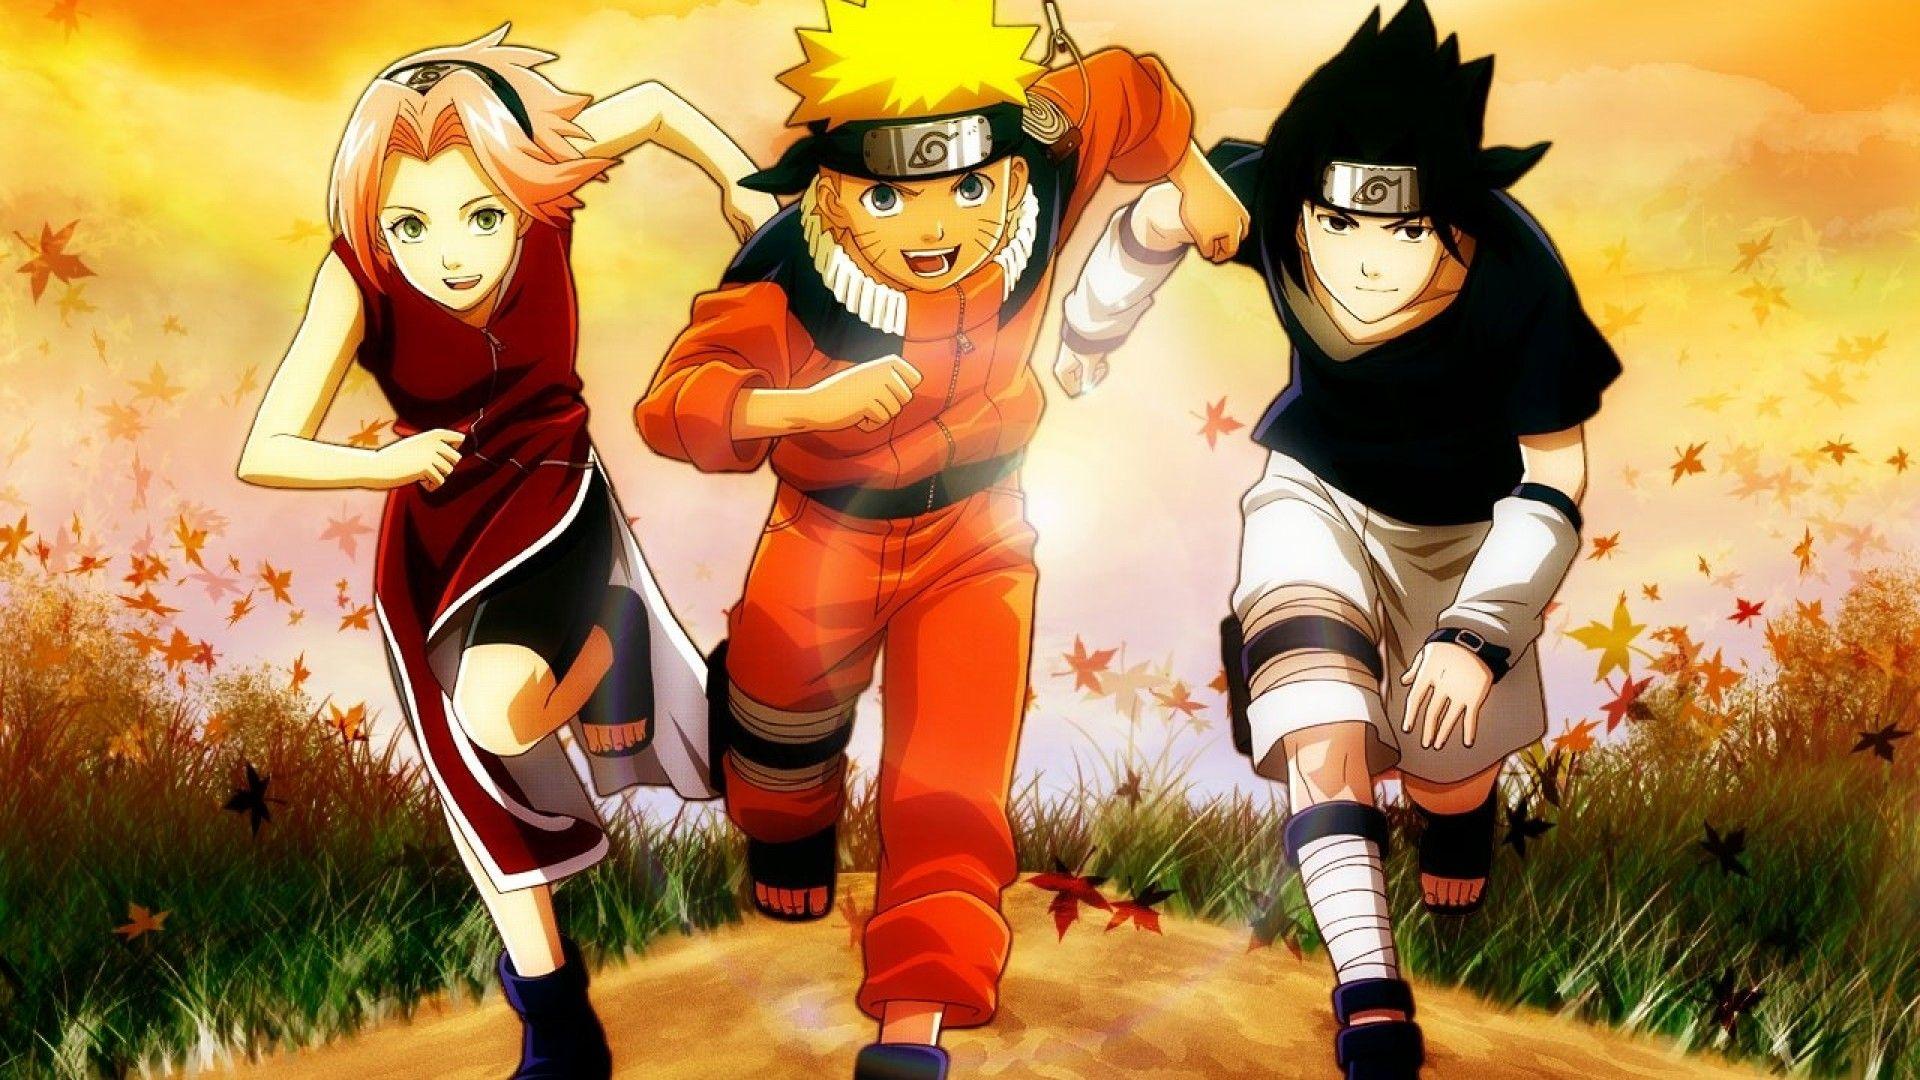 Cute Team 7 3 Naruto Images Wallpaper Naruto Shippuden Anime